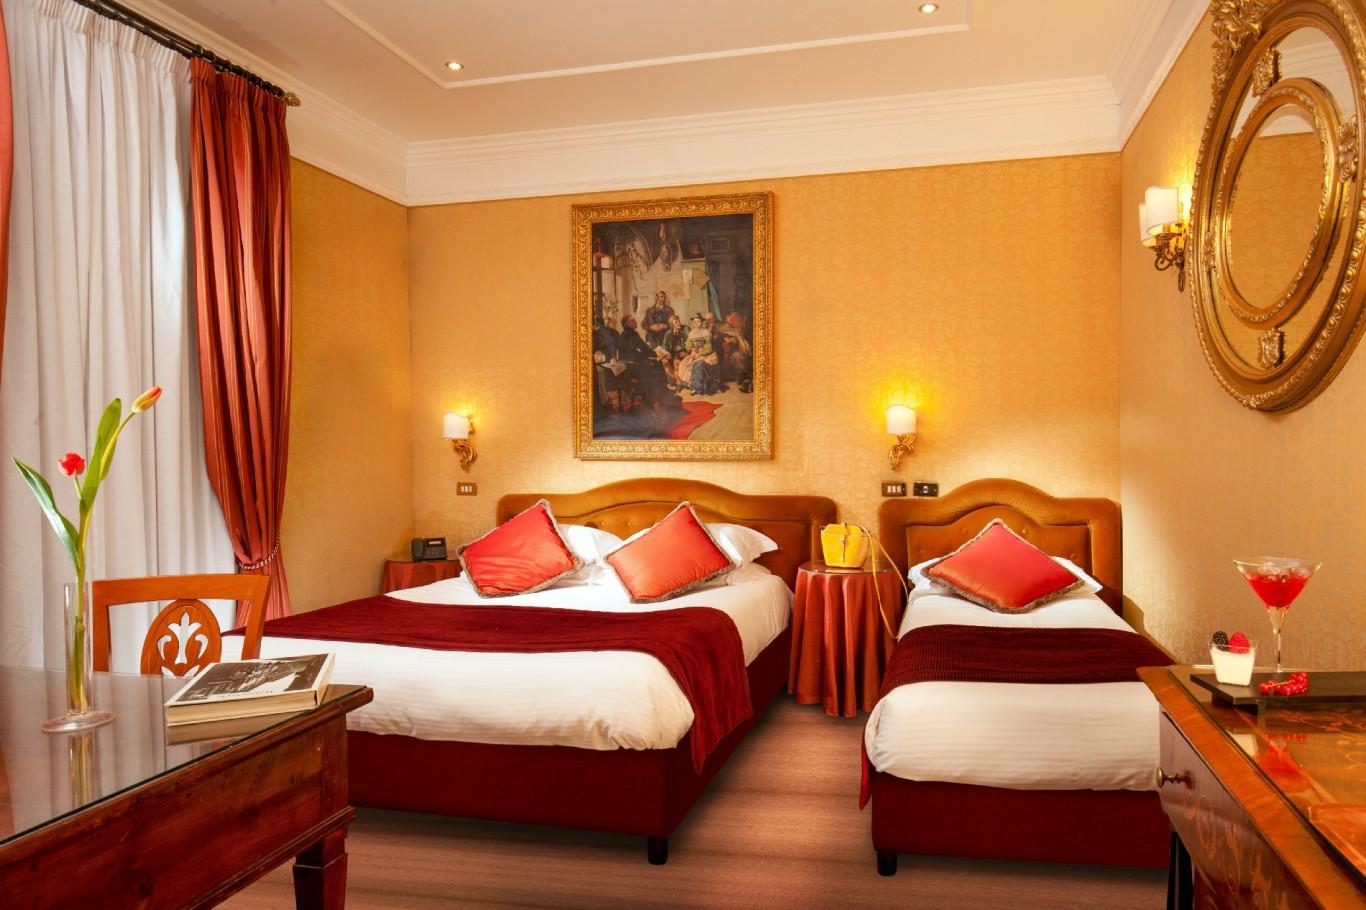 Hotel-Morgana-Roma-habitacion-deluxe1